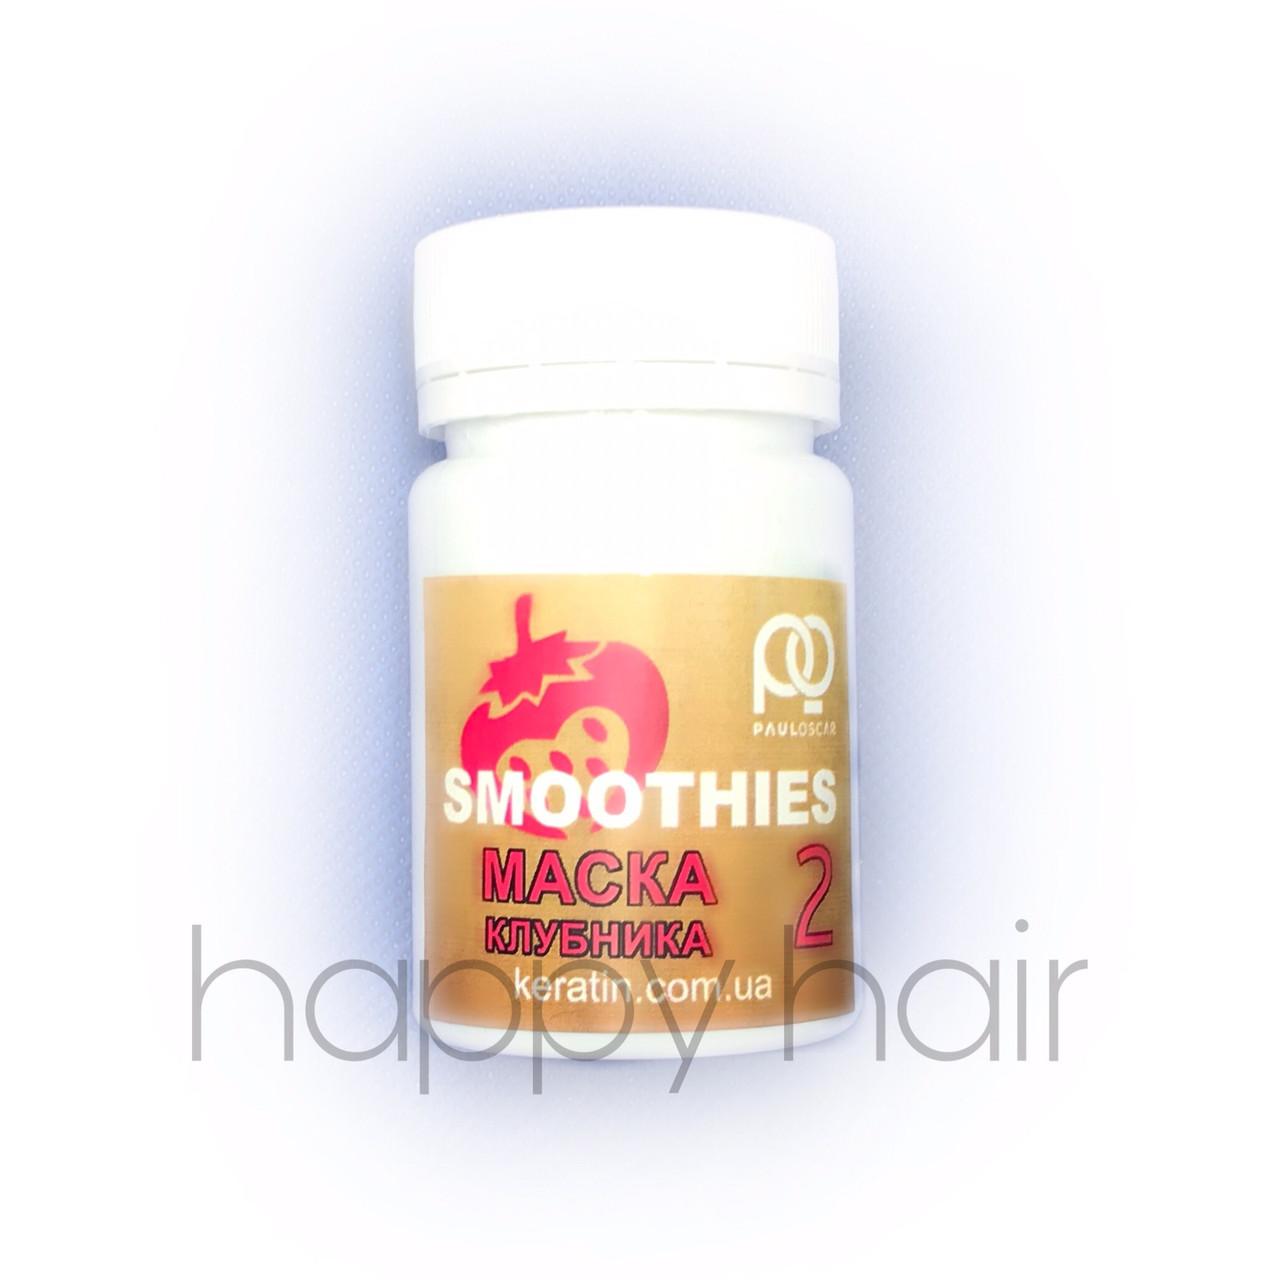 Paul Oscar Smoothies Smooth & Silky Strawberry Кератин для волос (шаг 2) 50 мл